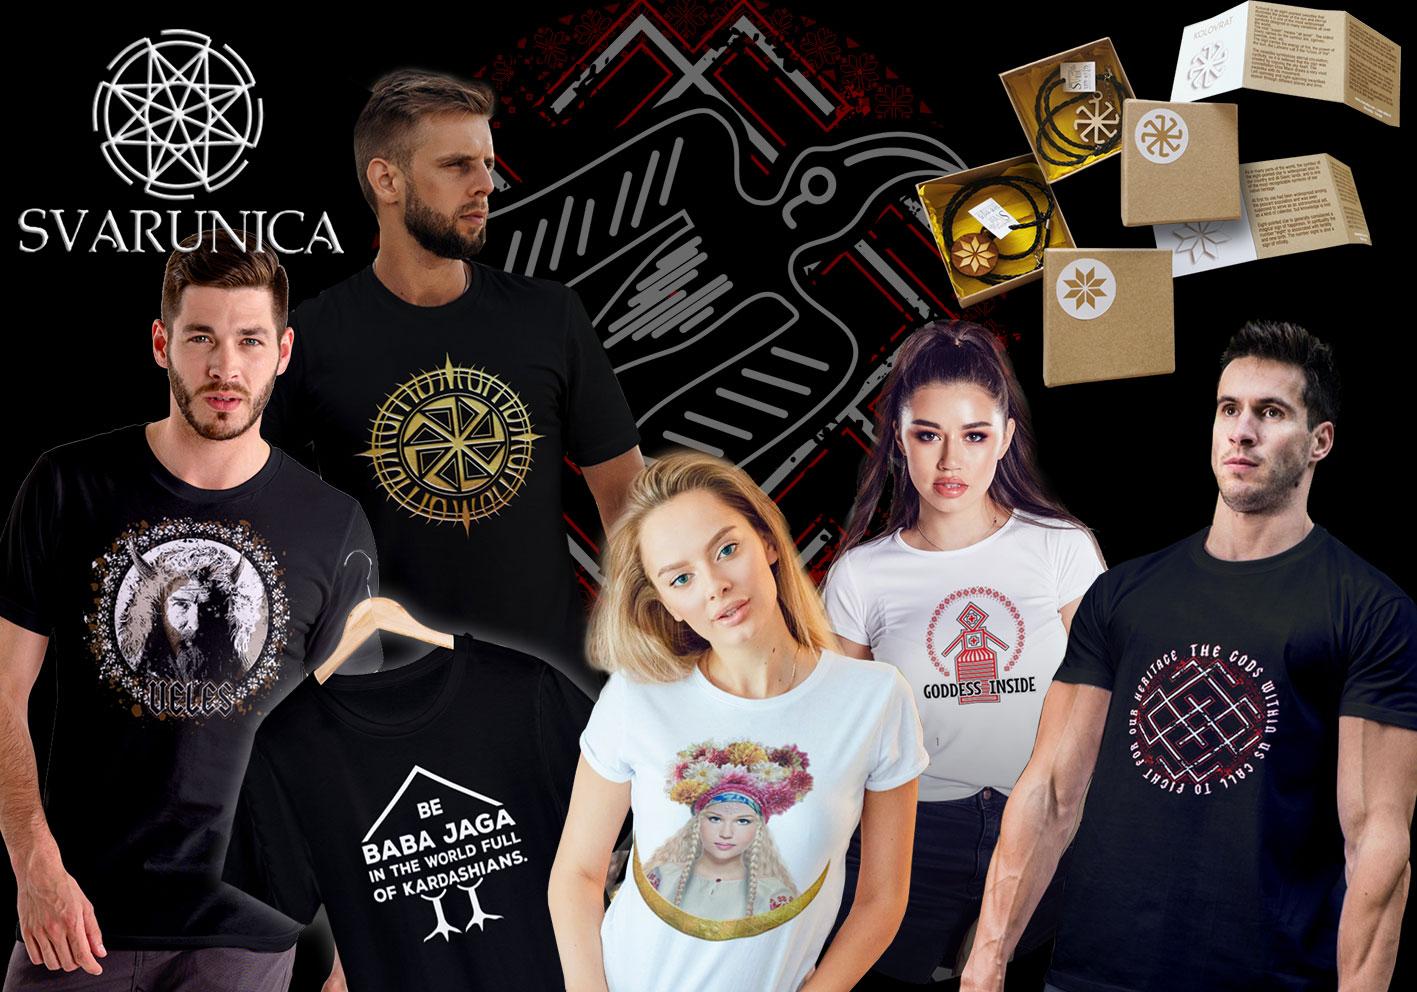 shop-svarunica-items